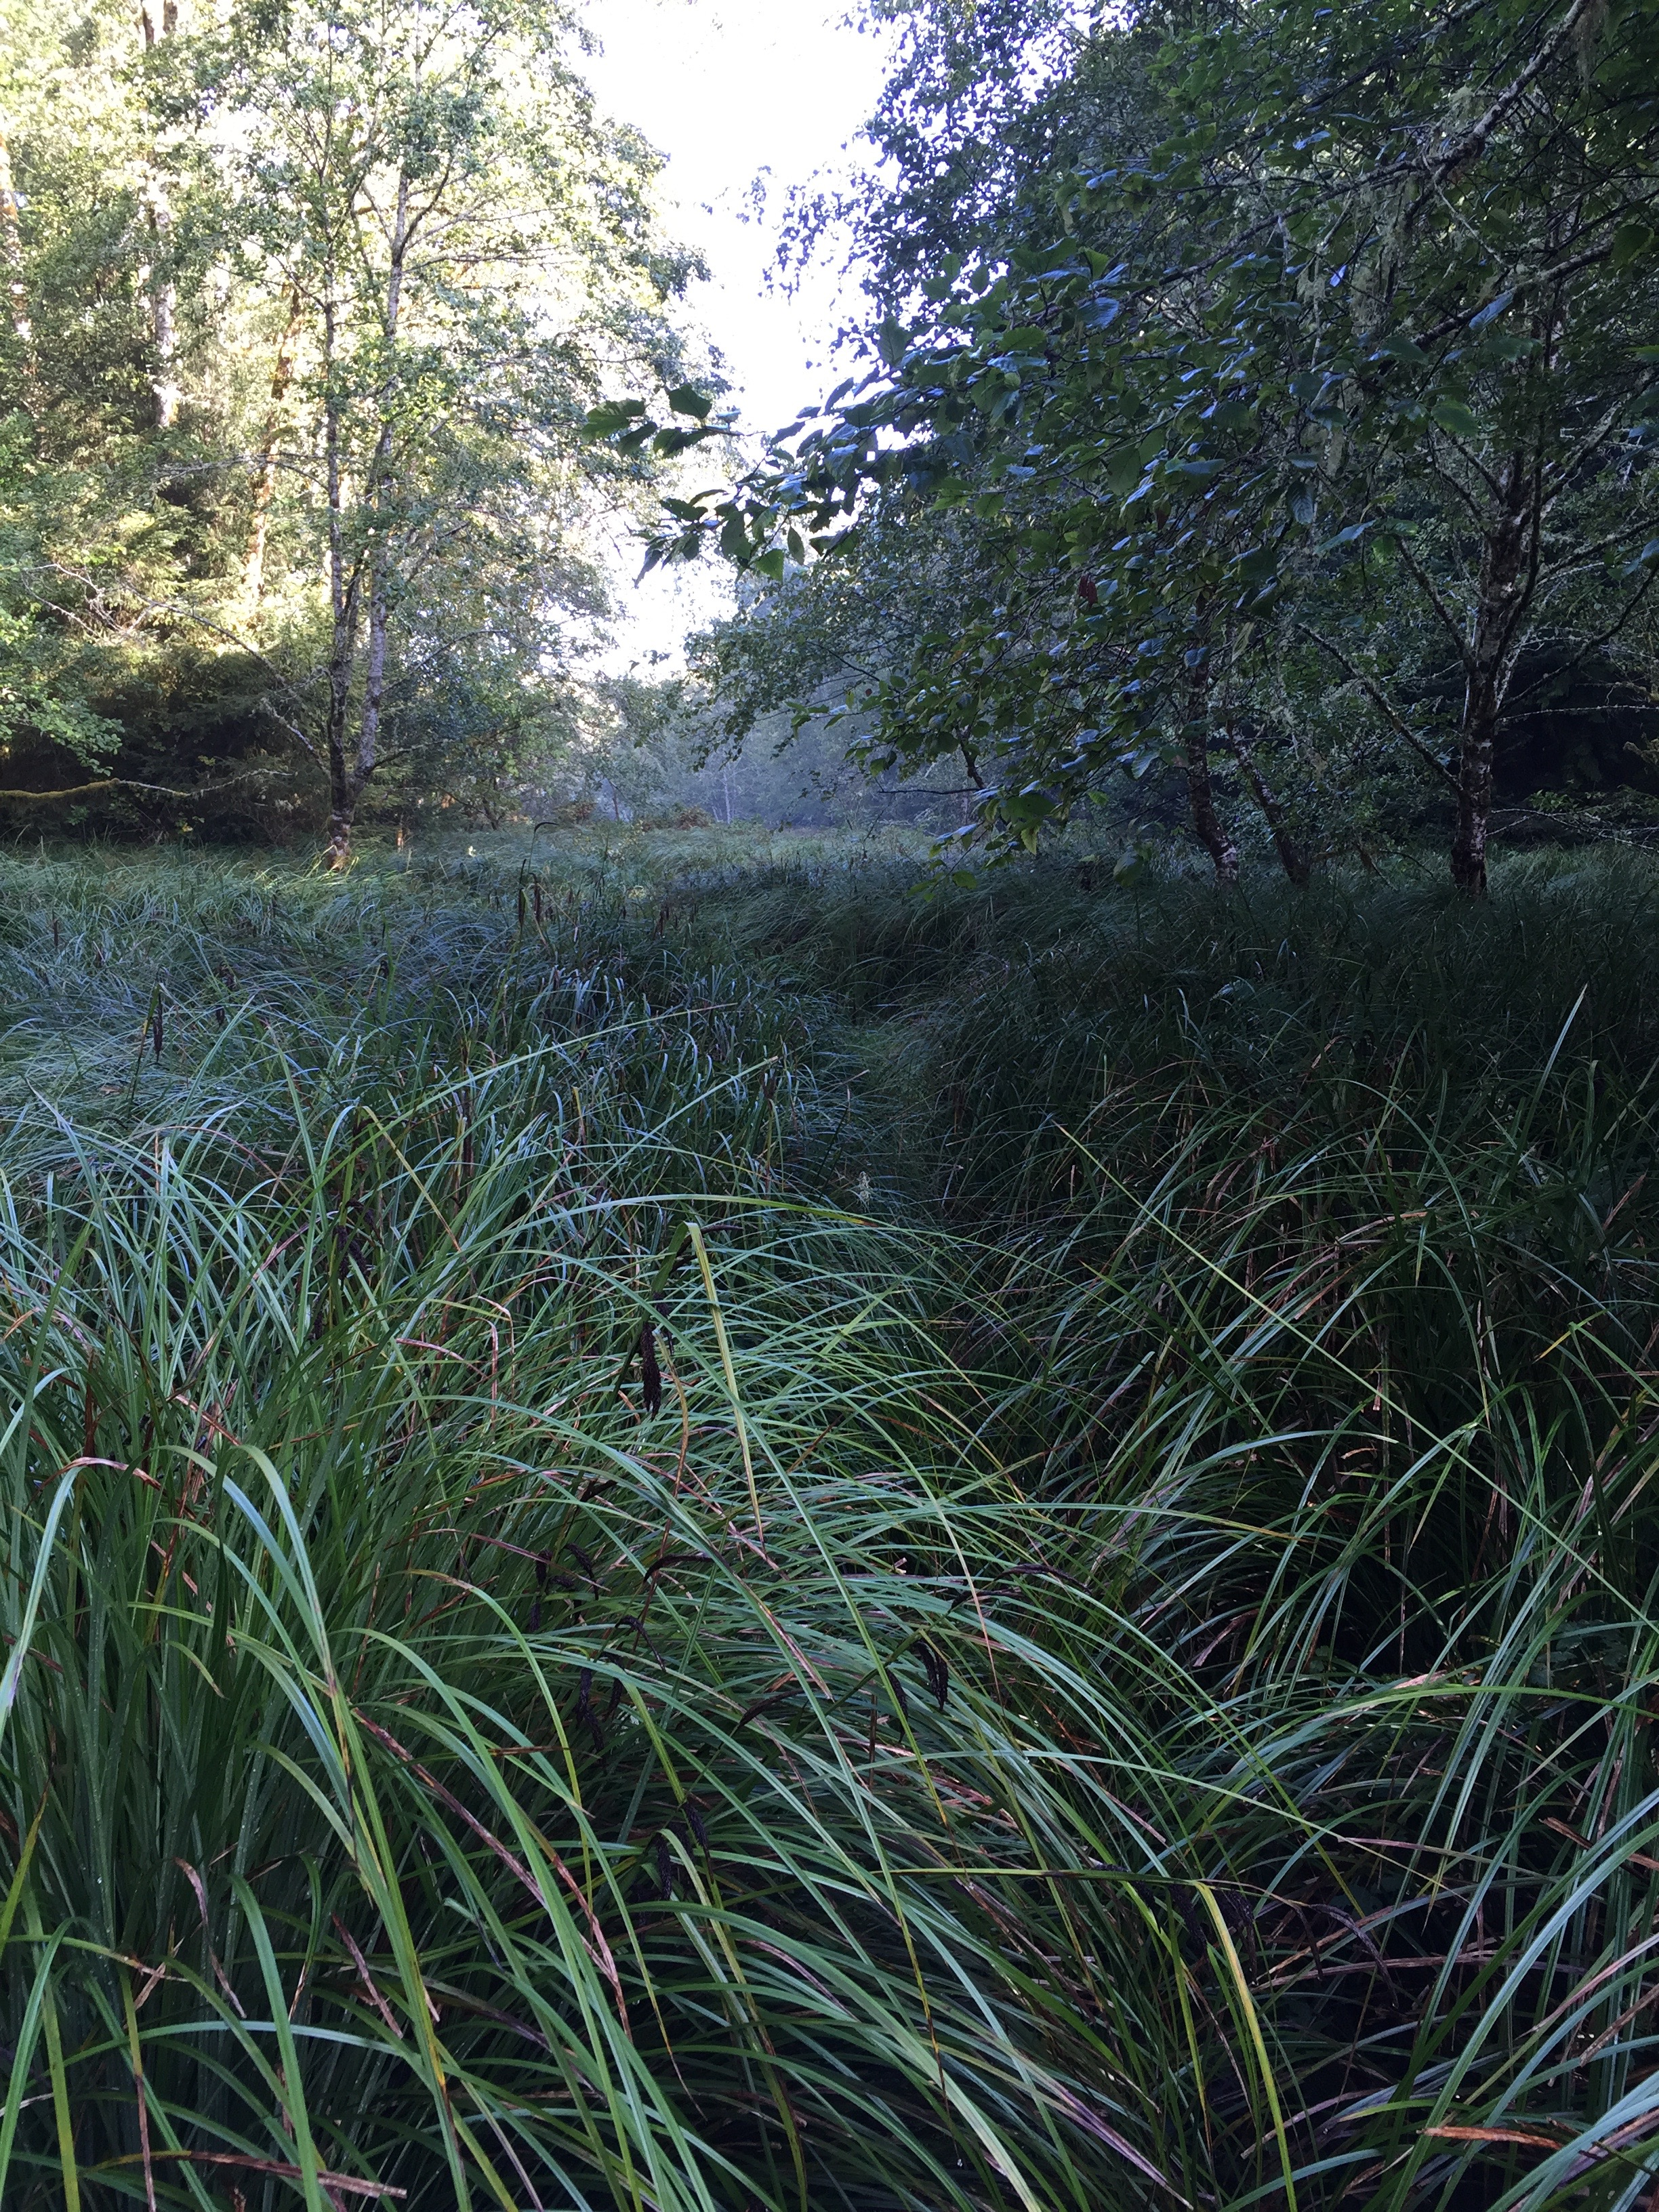 A meadow where the elk graze.